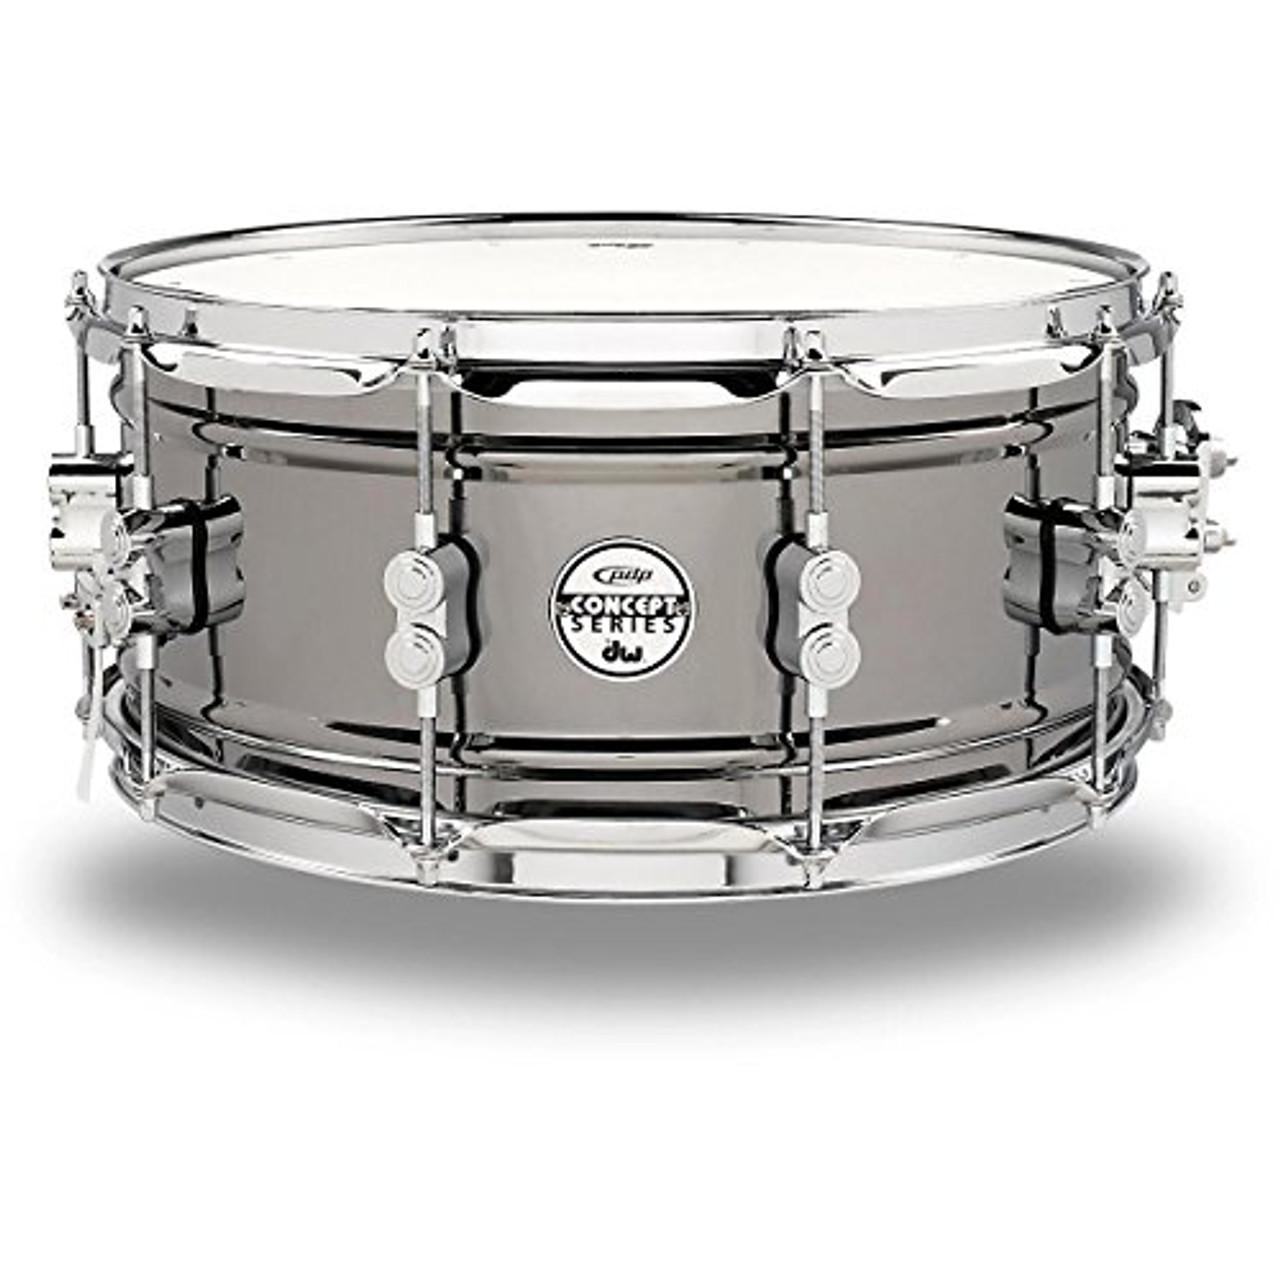 Drum Workshop Concept Snr 6.5x14, Bn Over Steel, Cr Hw